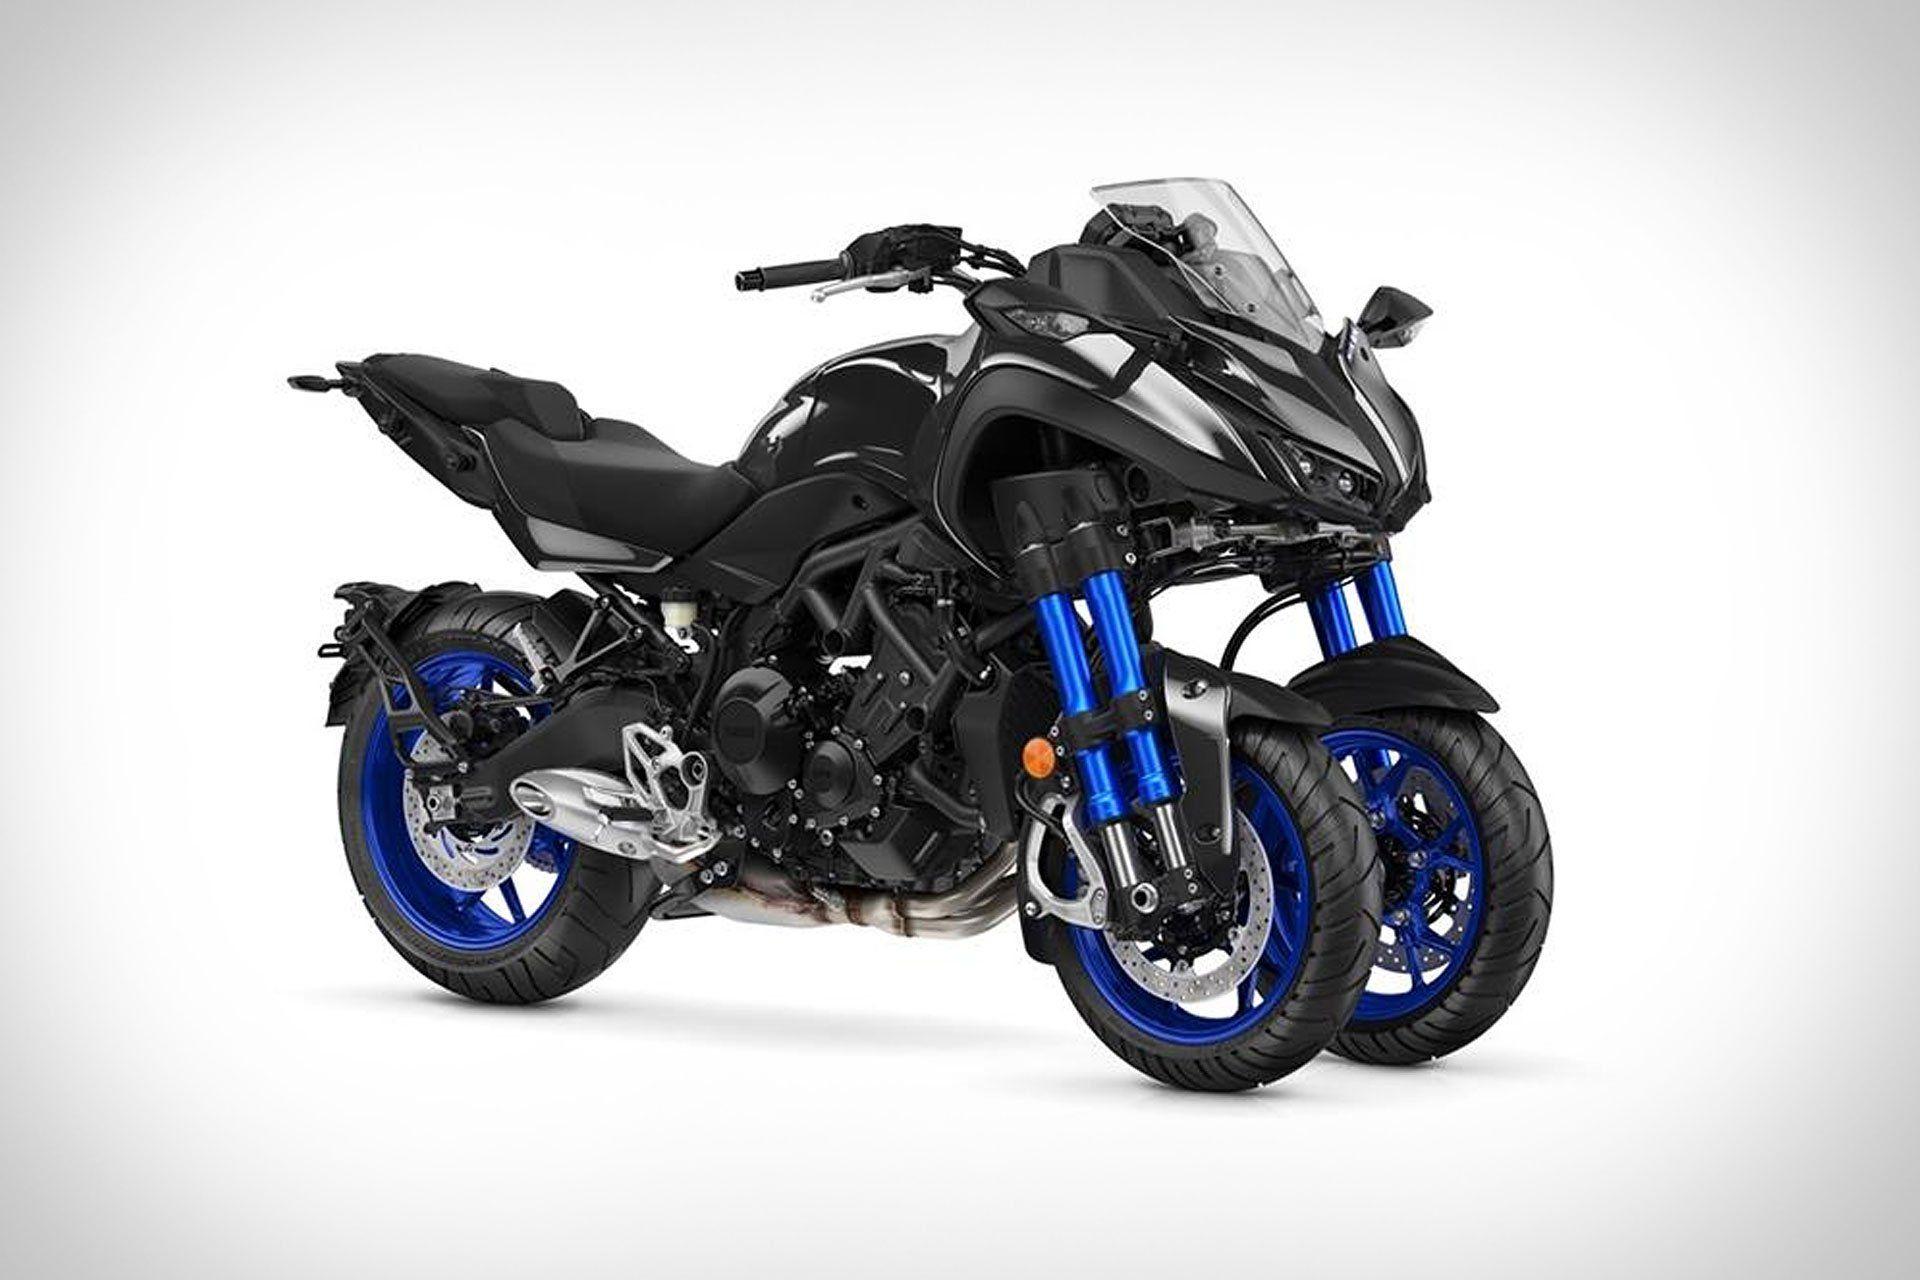 2019 Motorcycles Yamaha Release From 2019 Yamaha Niken Motorcycle Uncrate In 2019 Motorcycles Yamaha Release New Motorcycles Motorcycle Yamaha